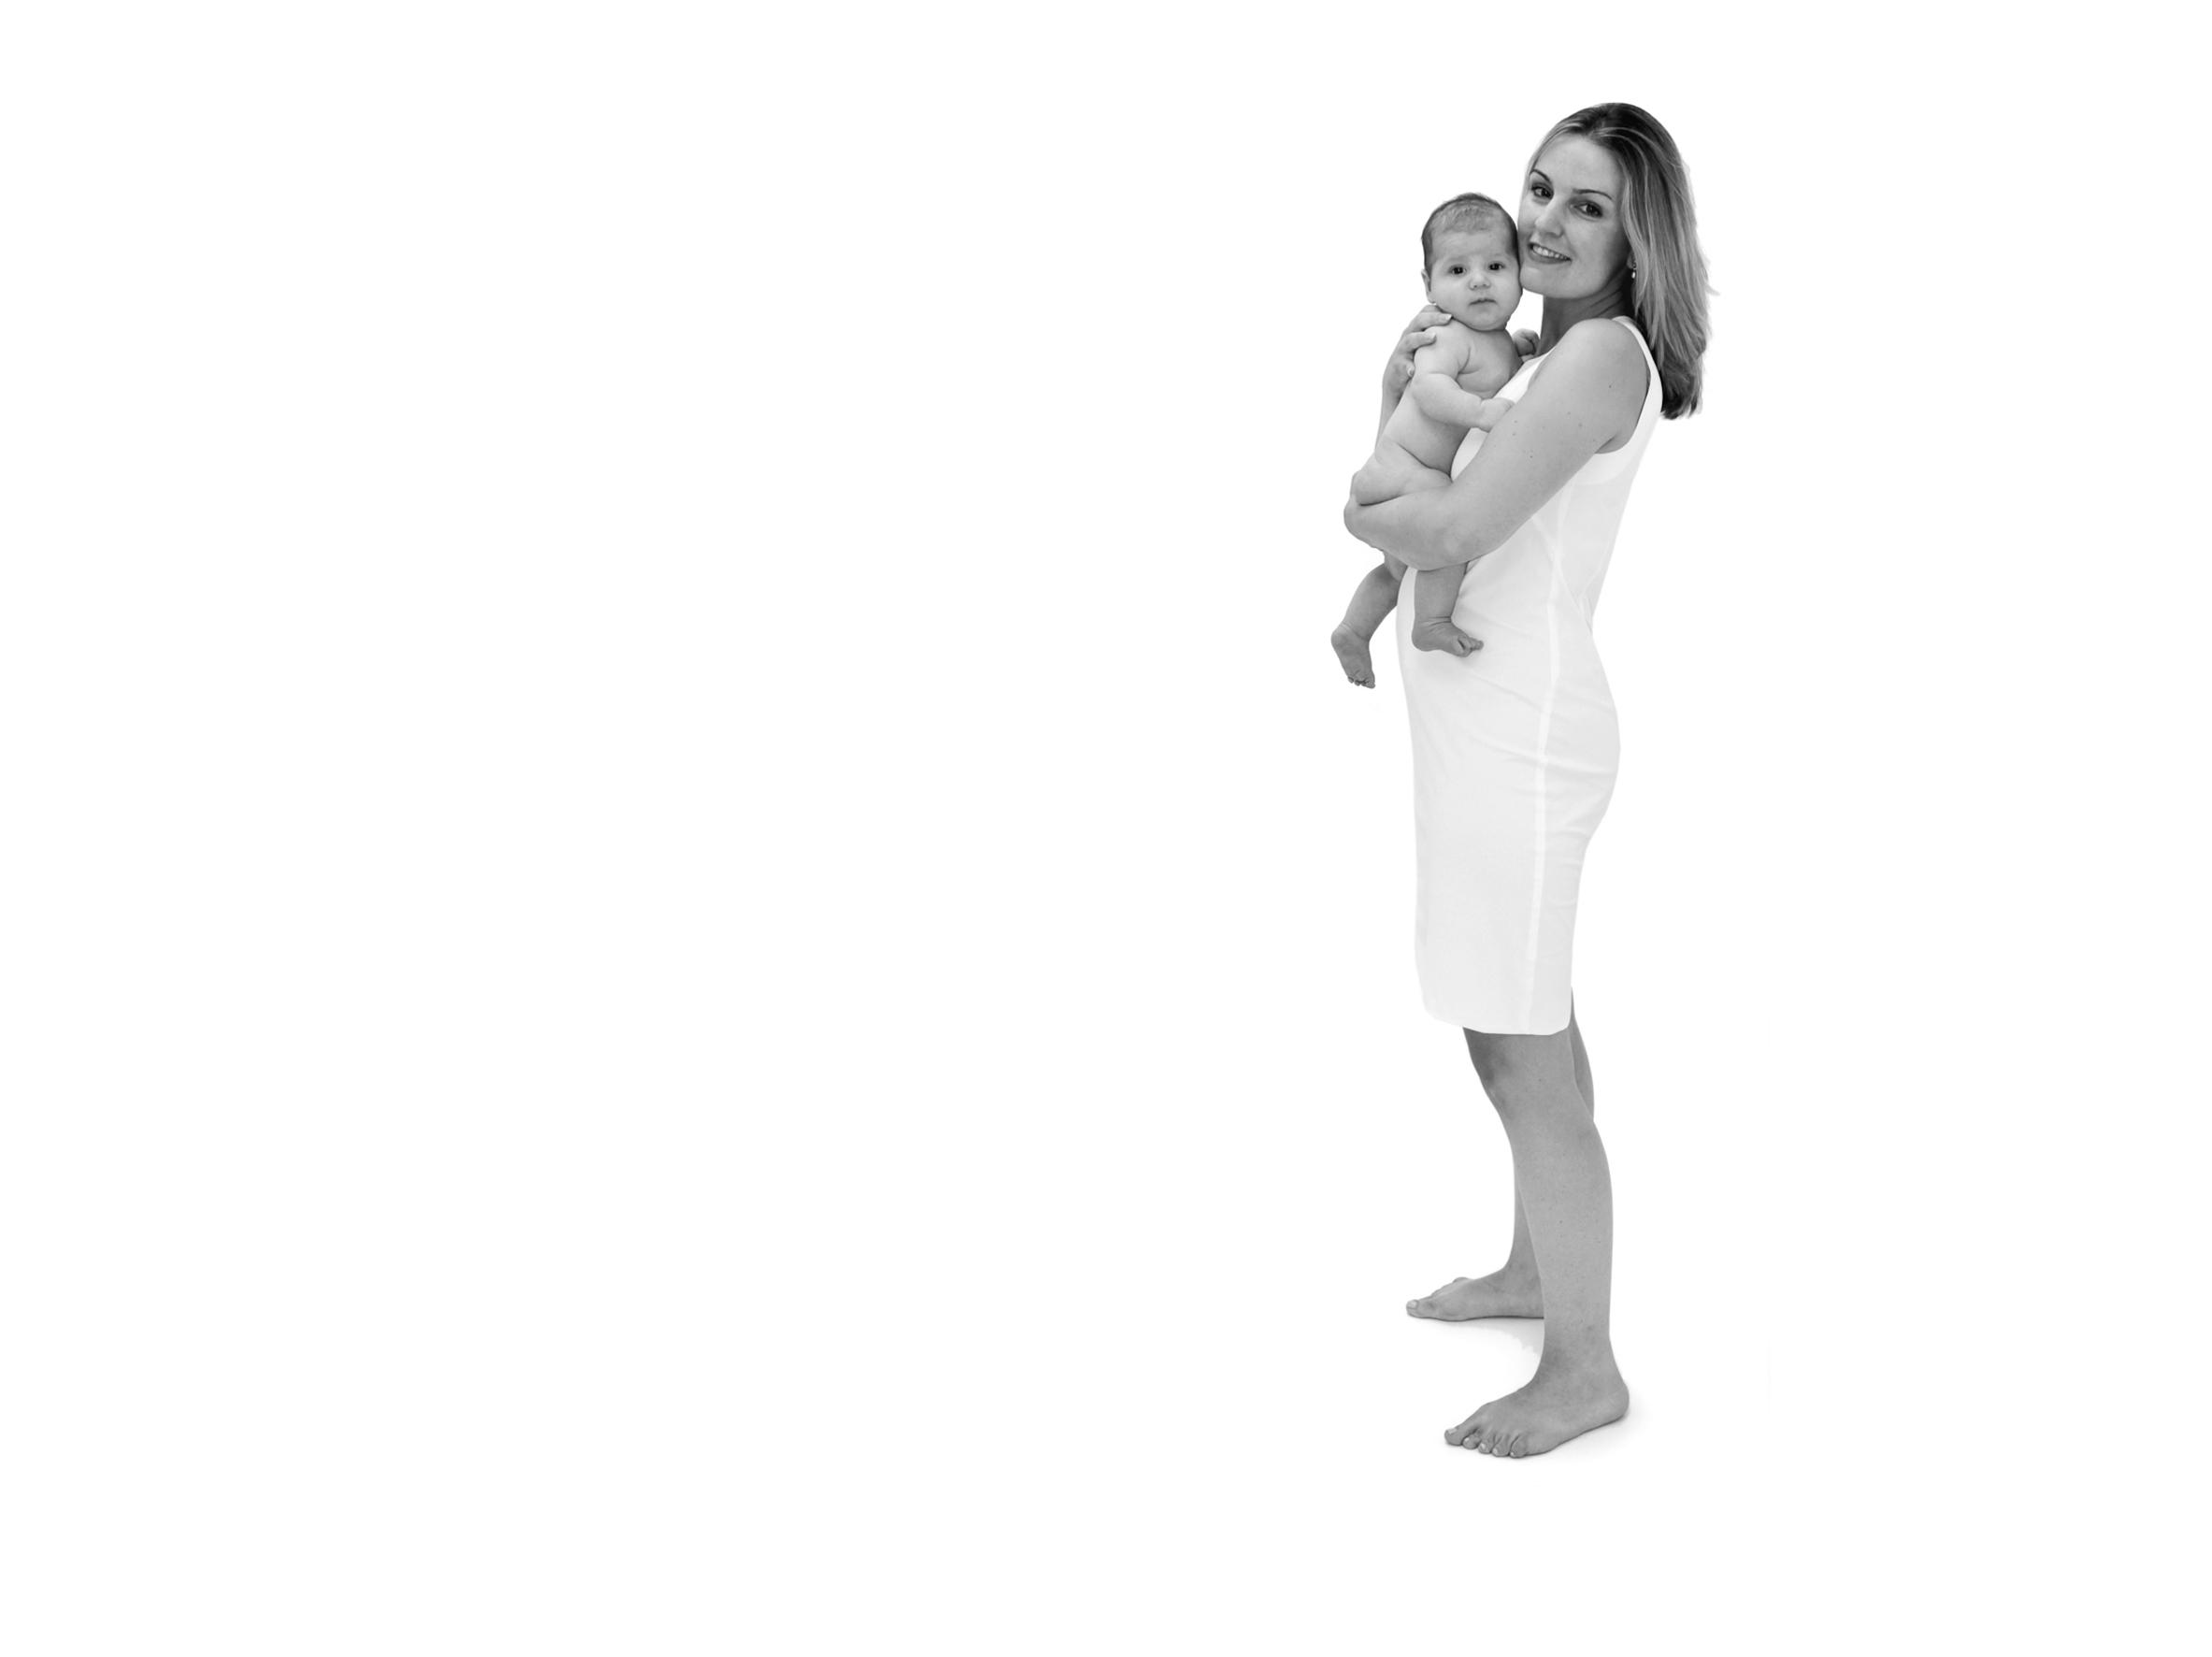 moeder baby fotoshoot amsterdam ks7445)landscape